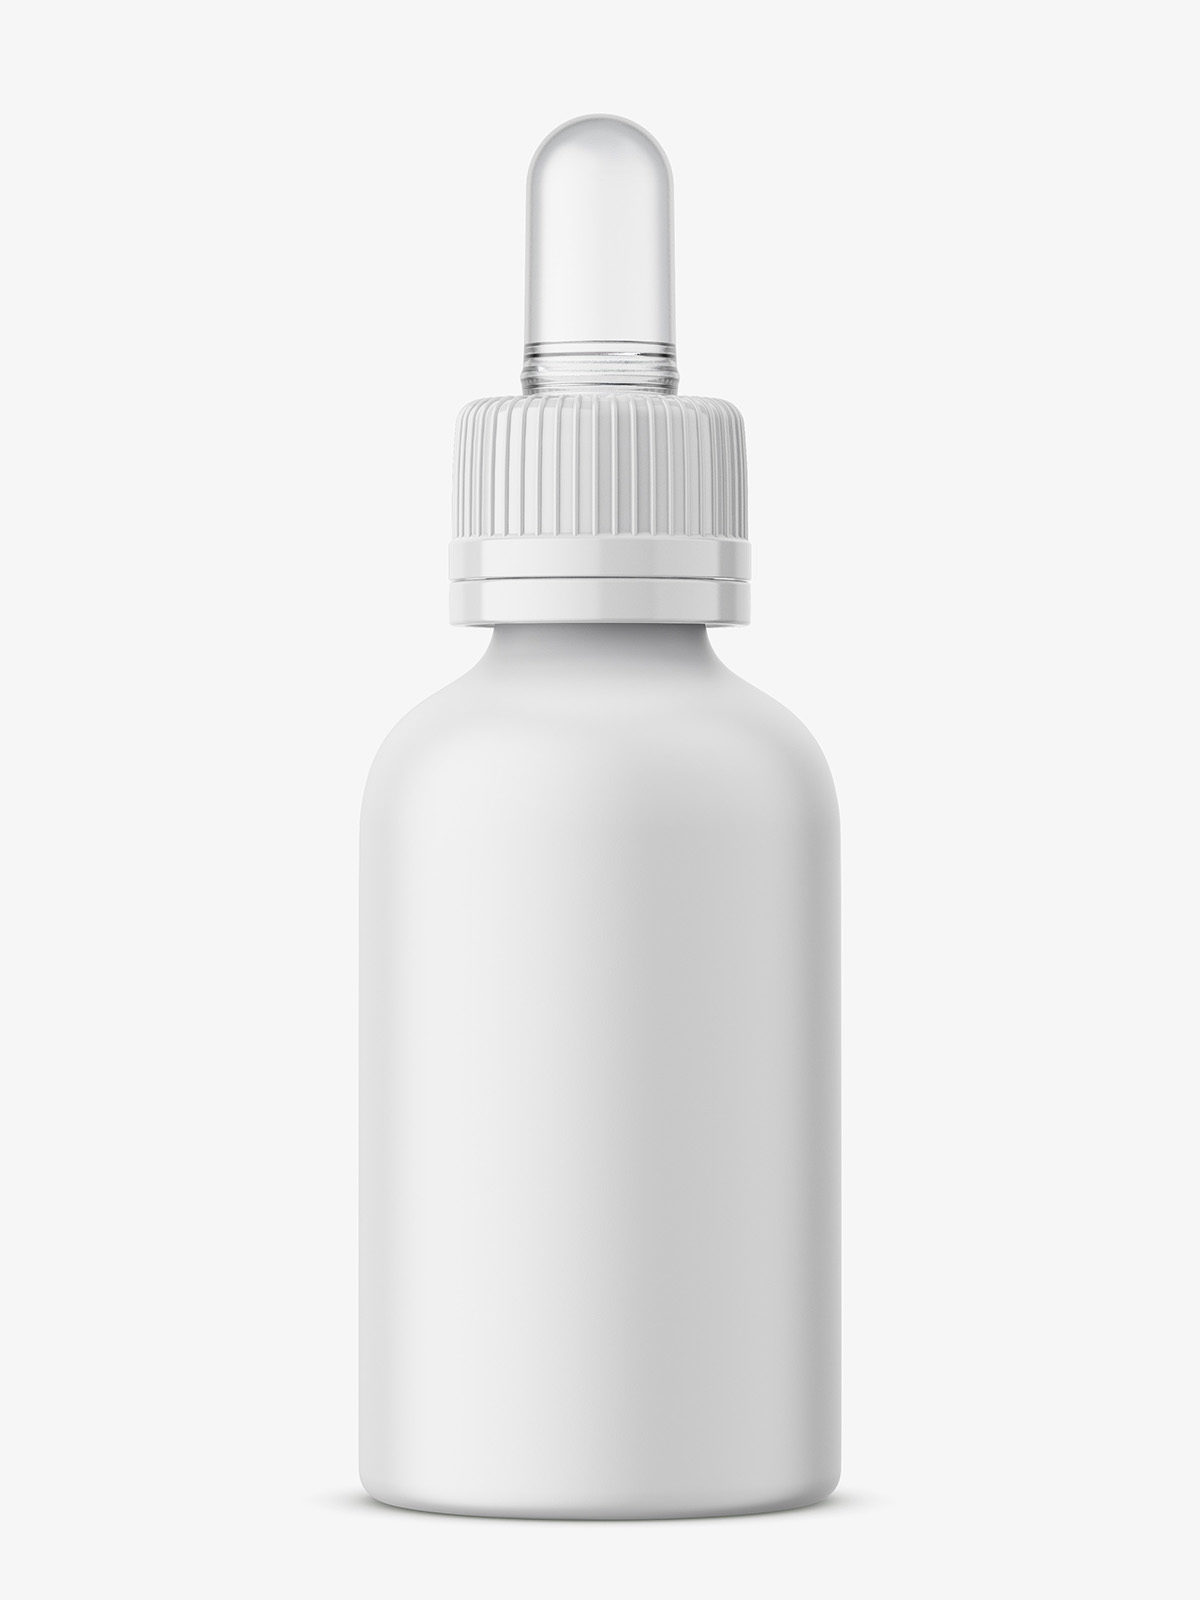 Plastic Matt Dropper Bottle Mockup Smarty Mockups